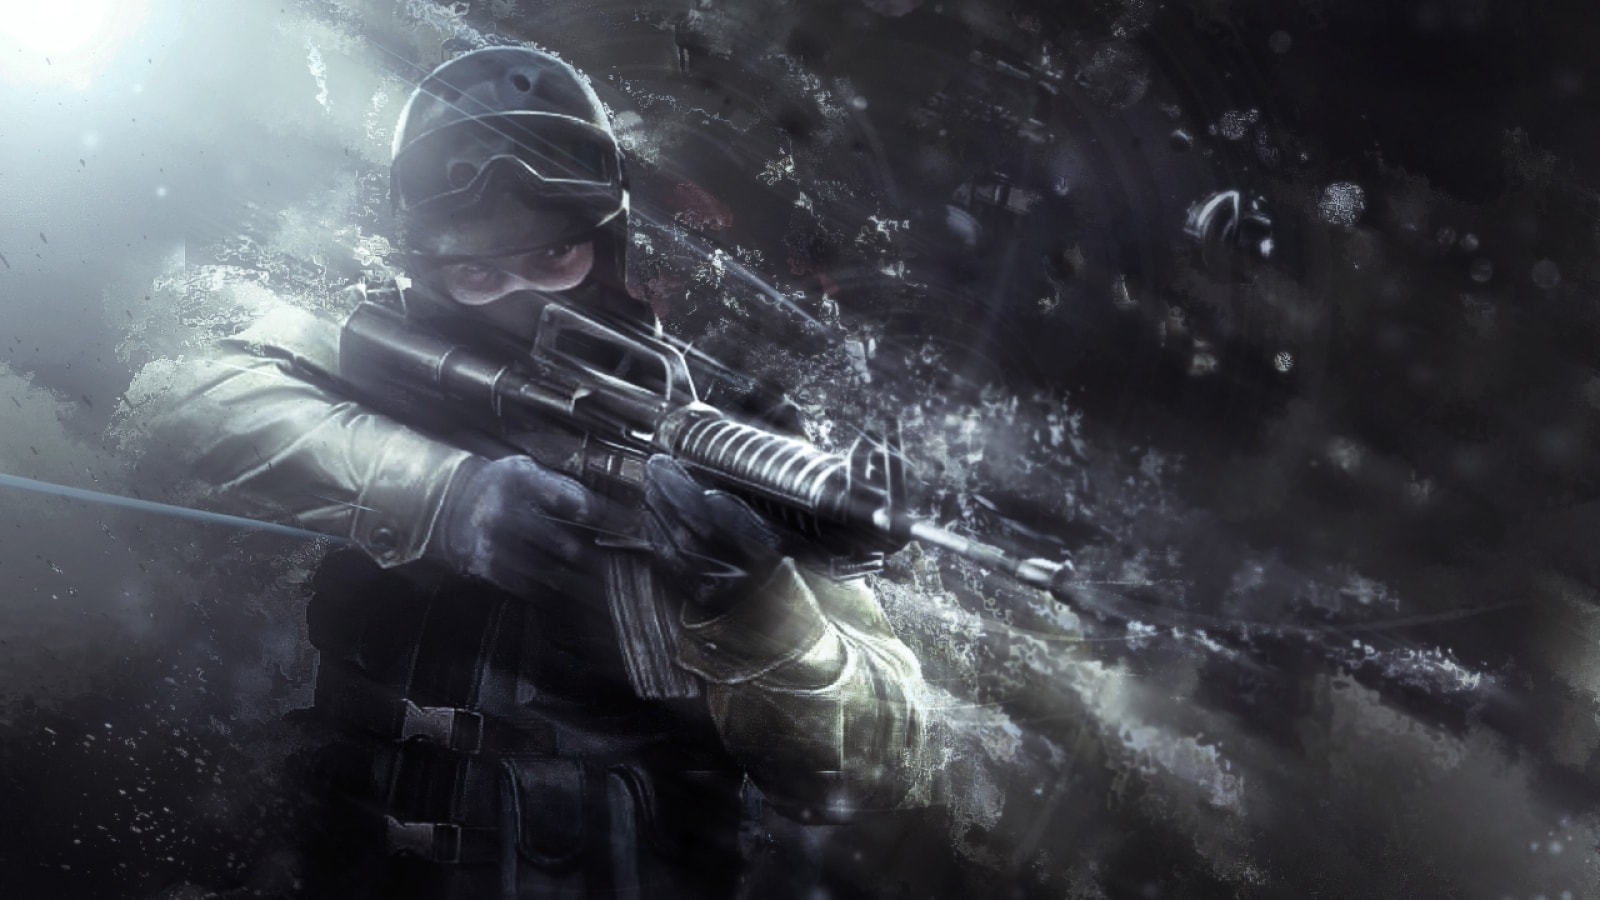 Counter-Strike: Global Offensive desktop wallpaper